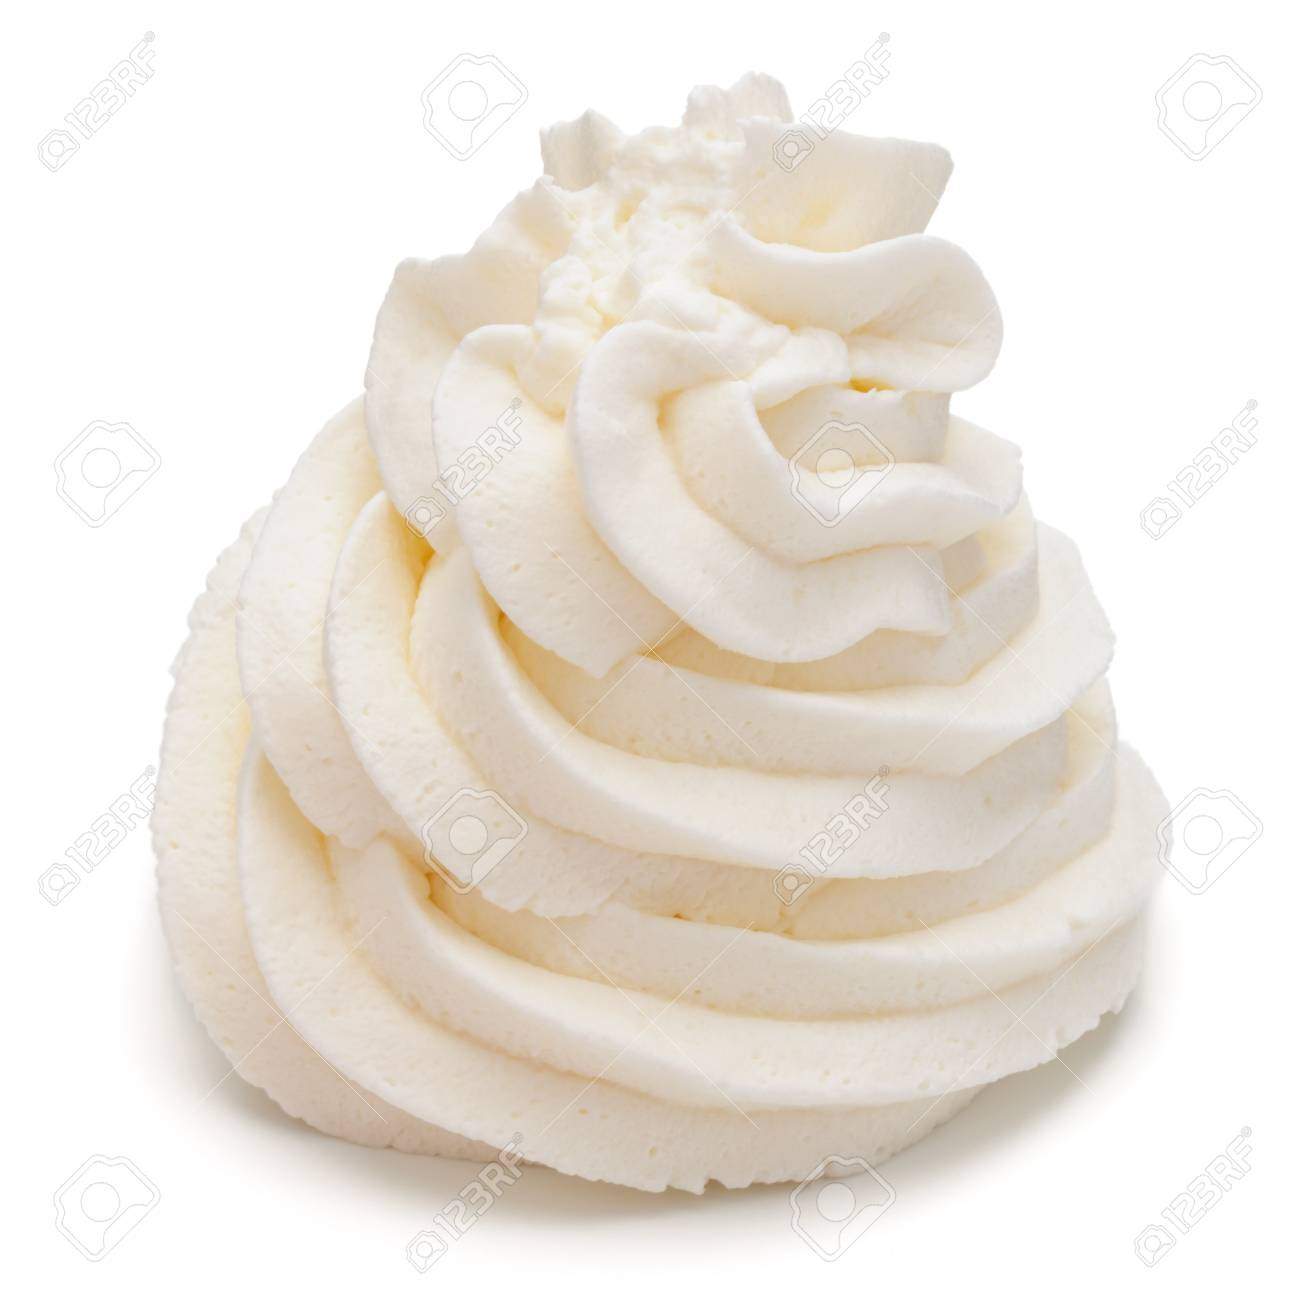 900ac3e5e Whipped Cream Swirl Isolated On White Background Cutout Stock Photo ...